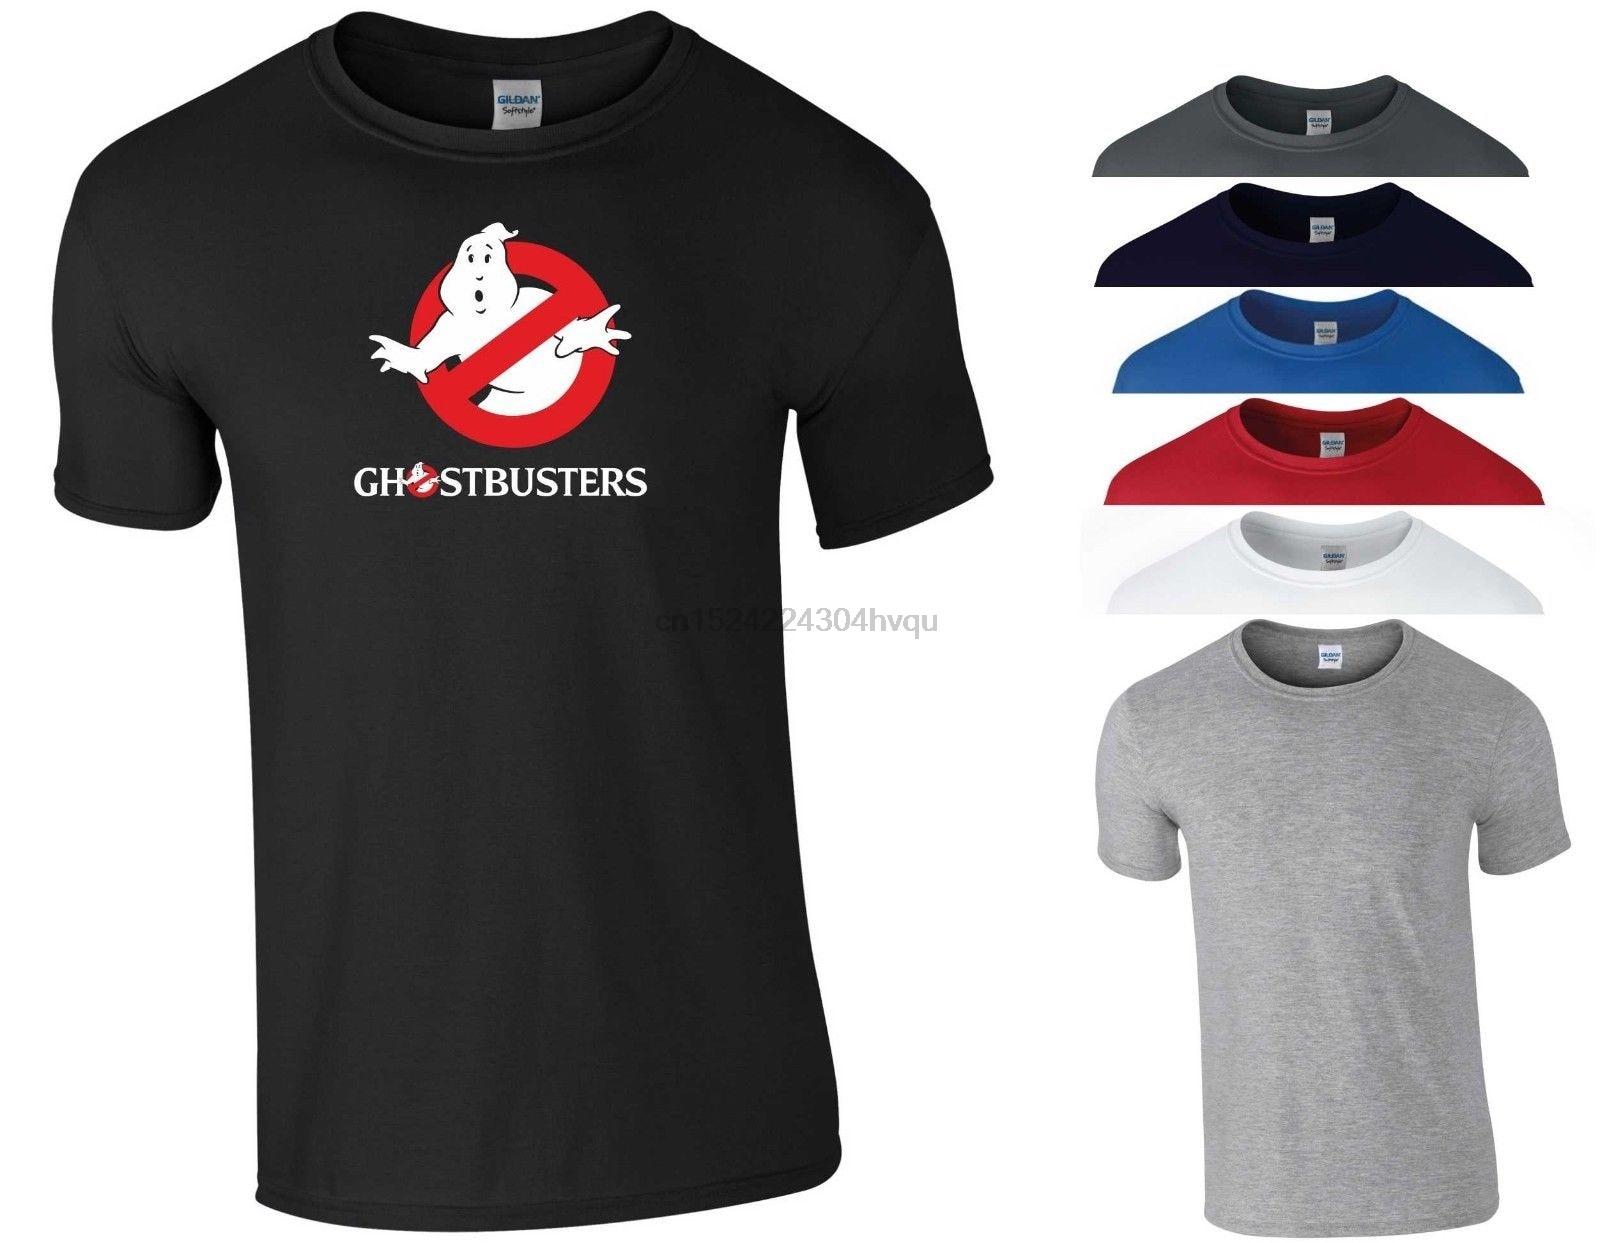 Ghostbusters T Shirt Classic Retro Movie Fans Funny Joke Birthday Gift Men Top